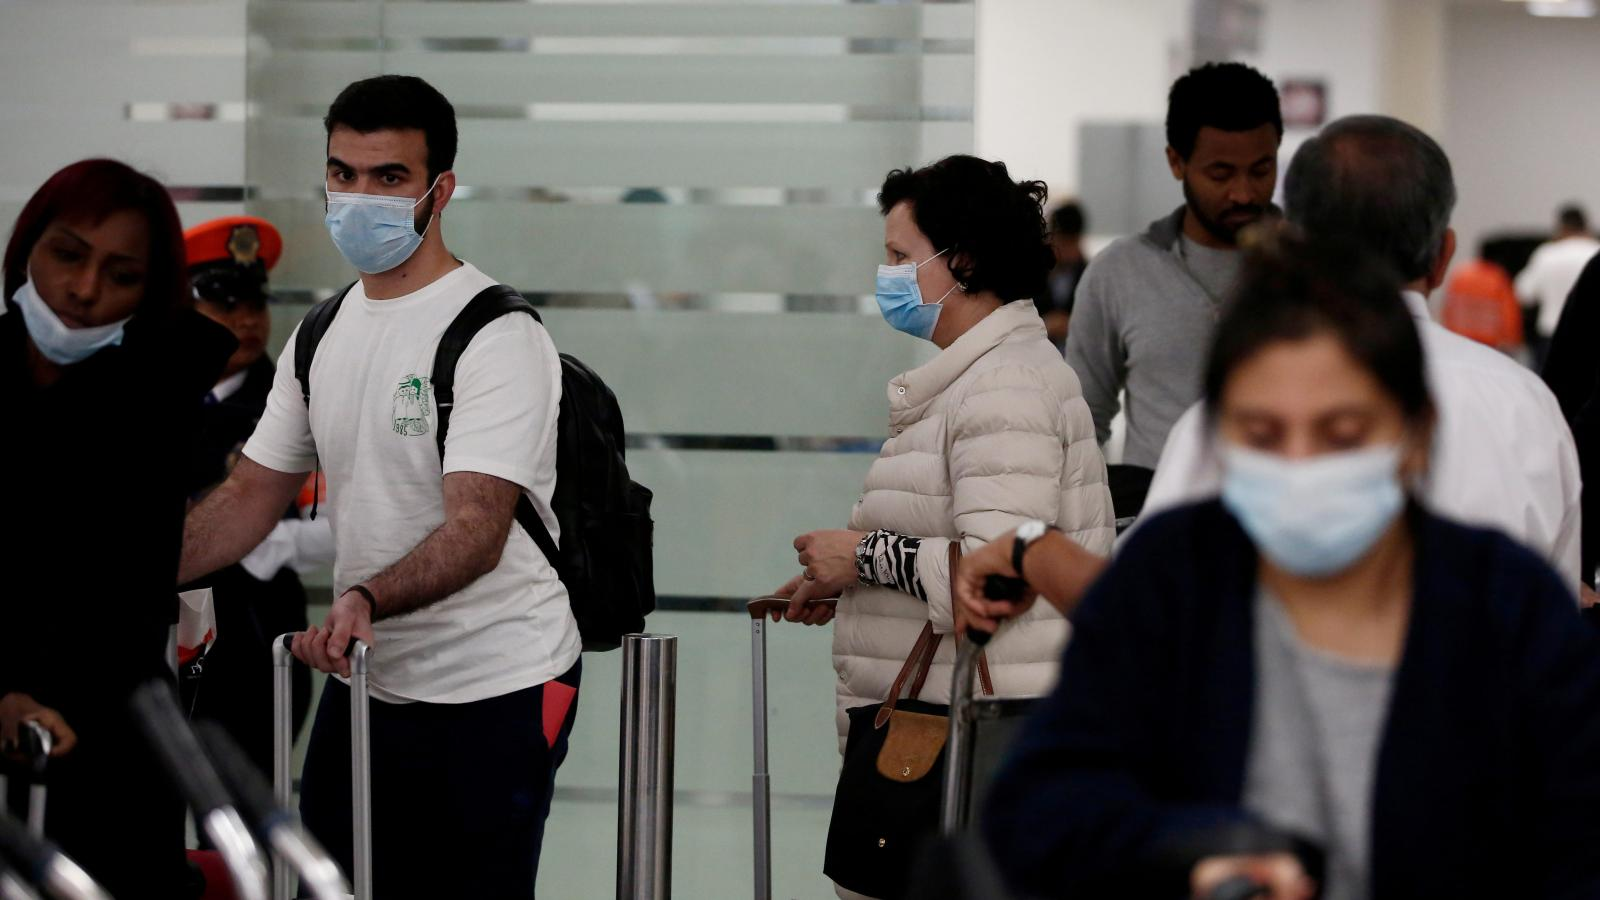 Coronavirus haunts aviation firms like IndiGo, Vistara, Air India ...